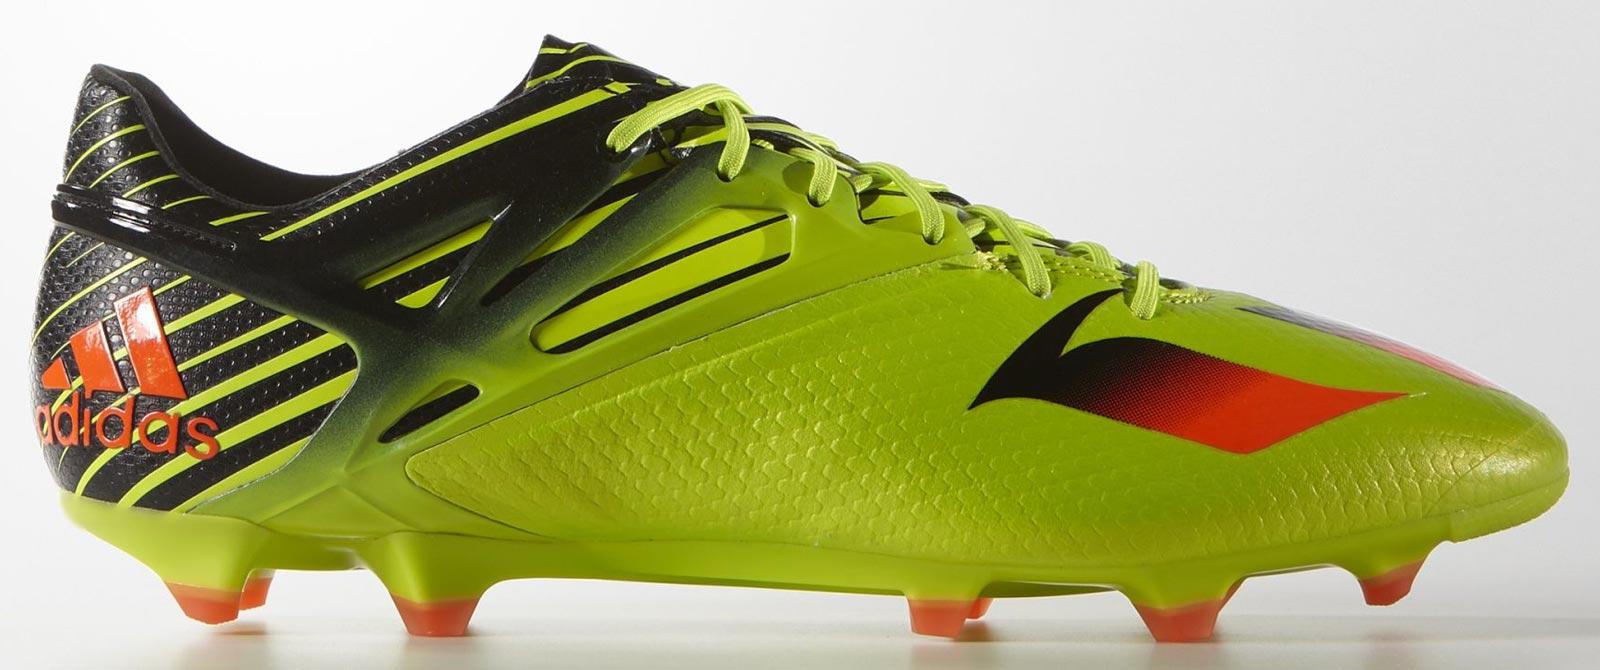 Adidas Messi 15.1 - Semi Solar Slime / Solar Red / Black